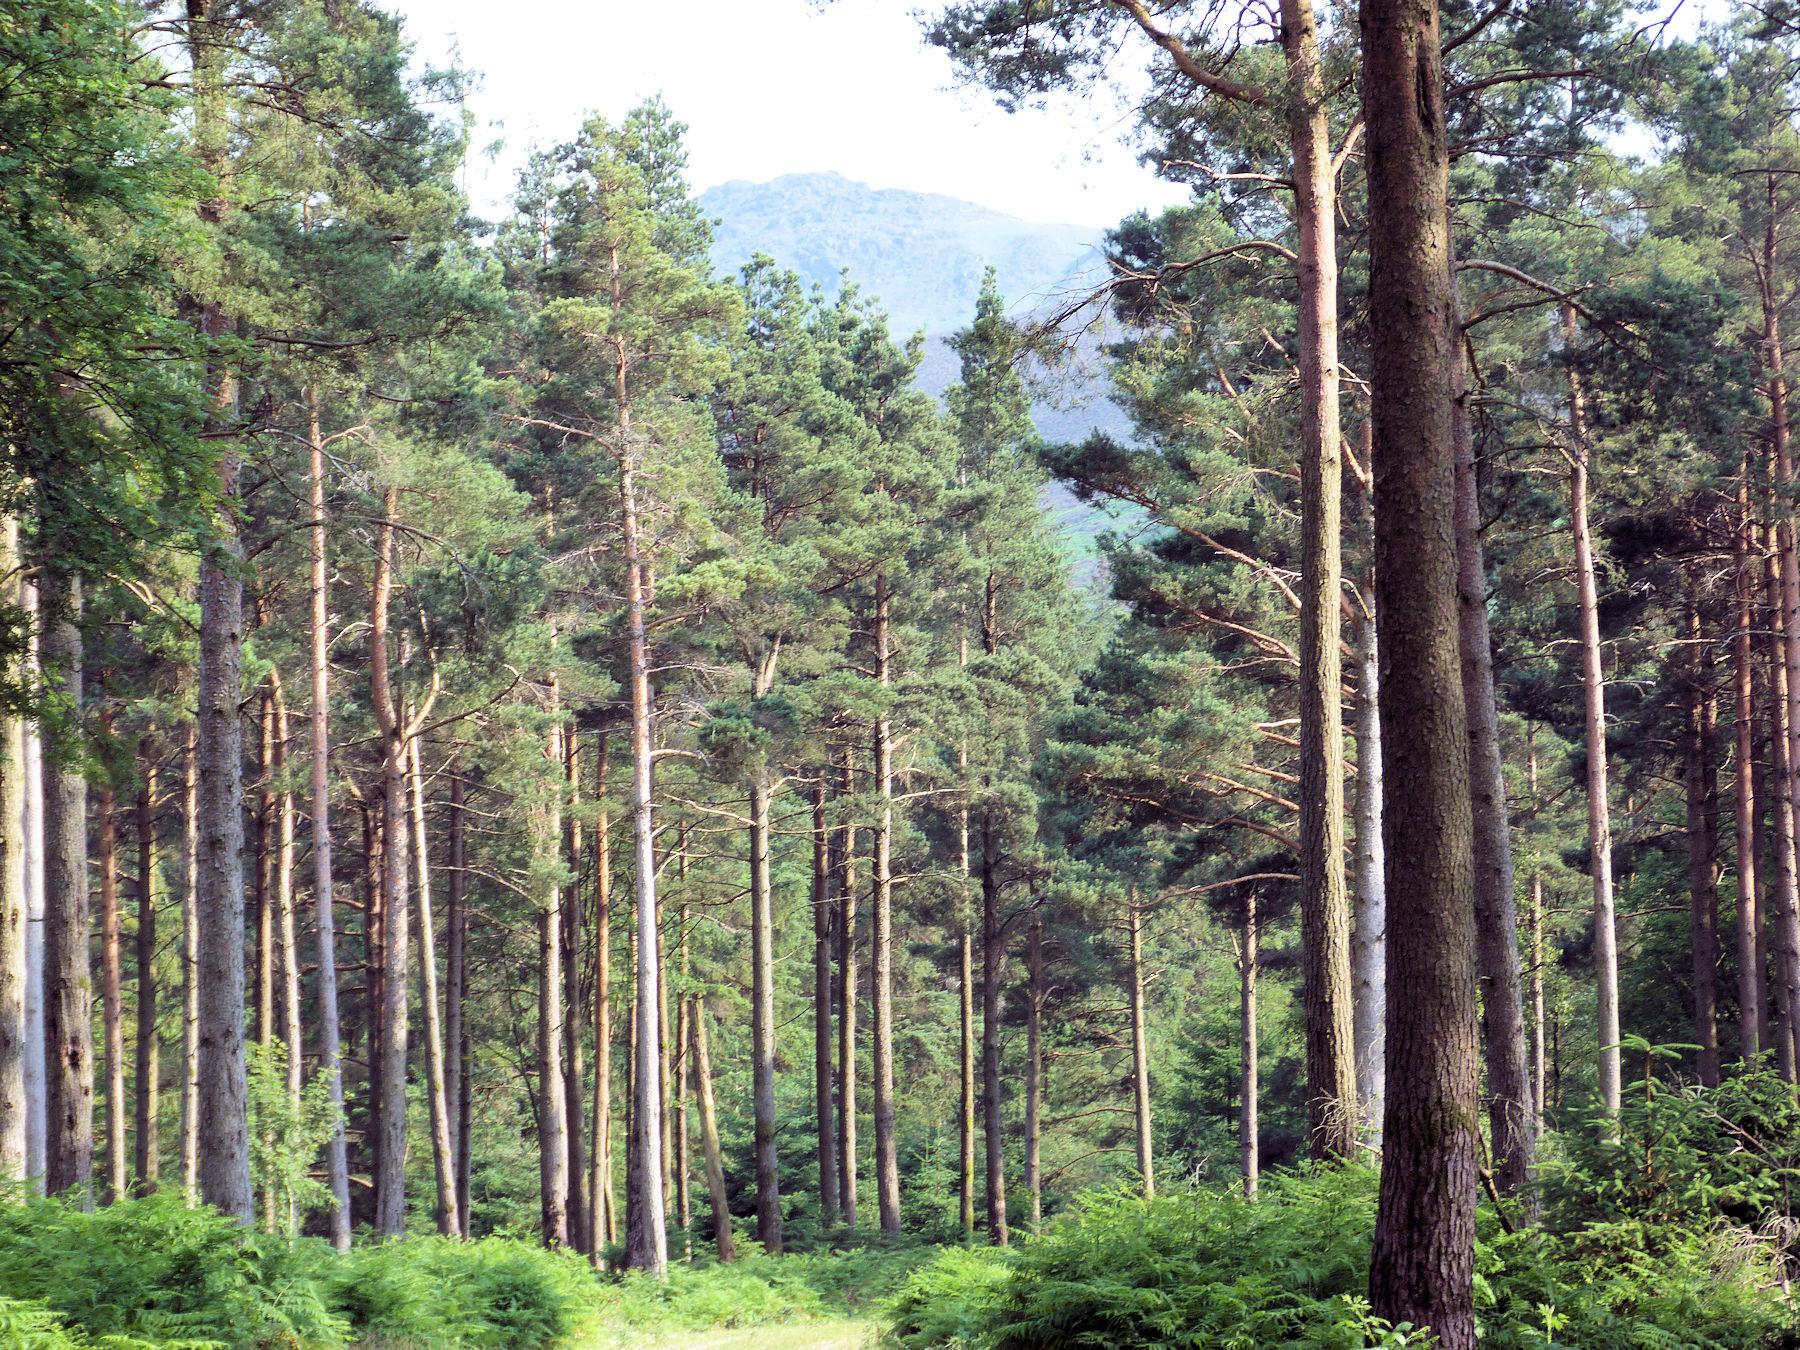 Ennerdale forestry